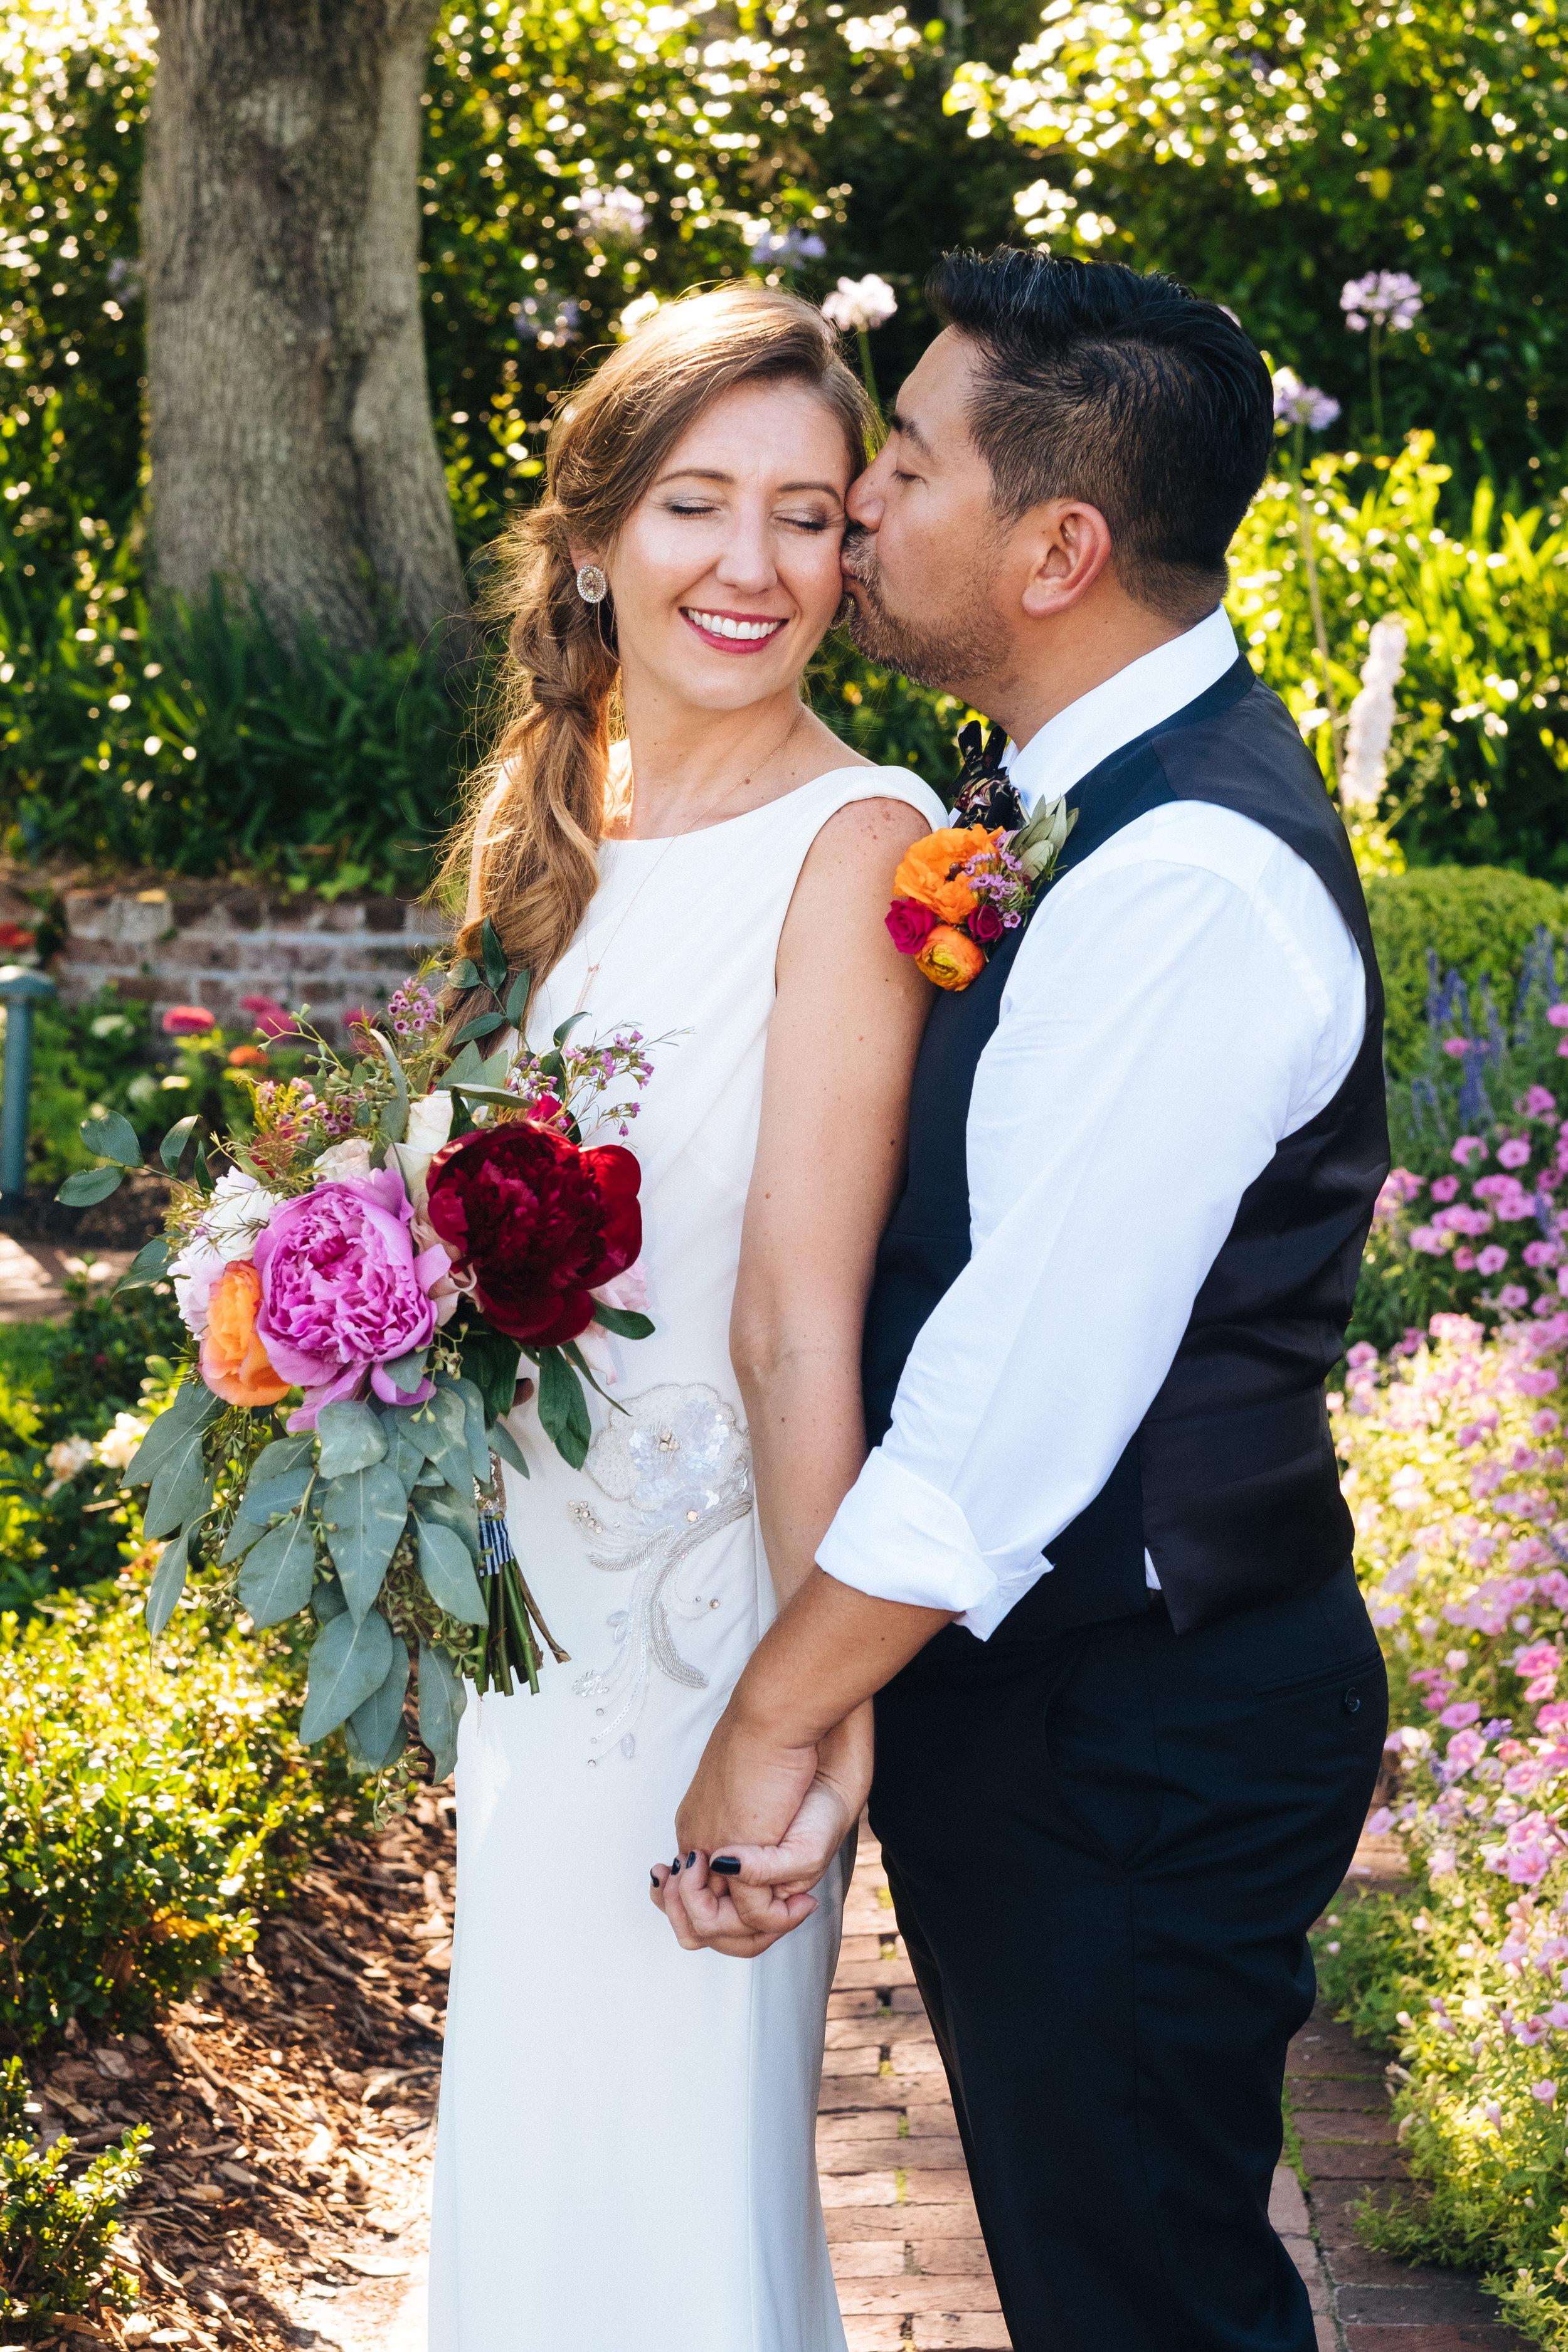 052717 Emily Varick Wedding HI RES-497.jpg